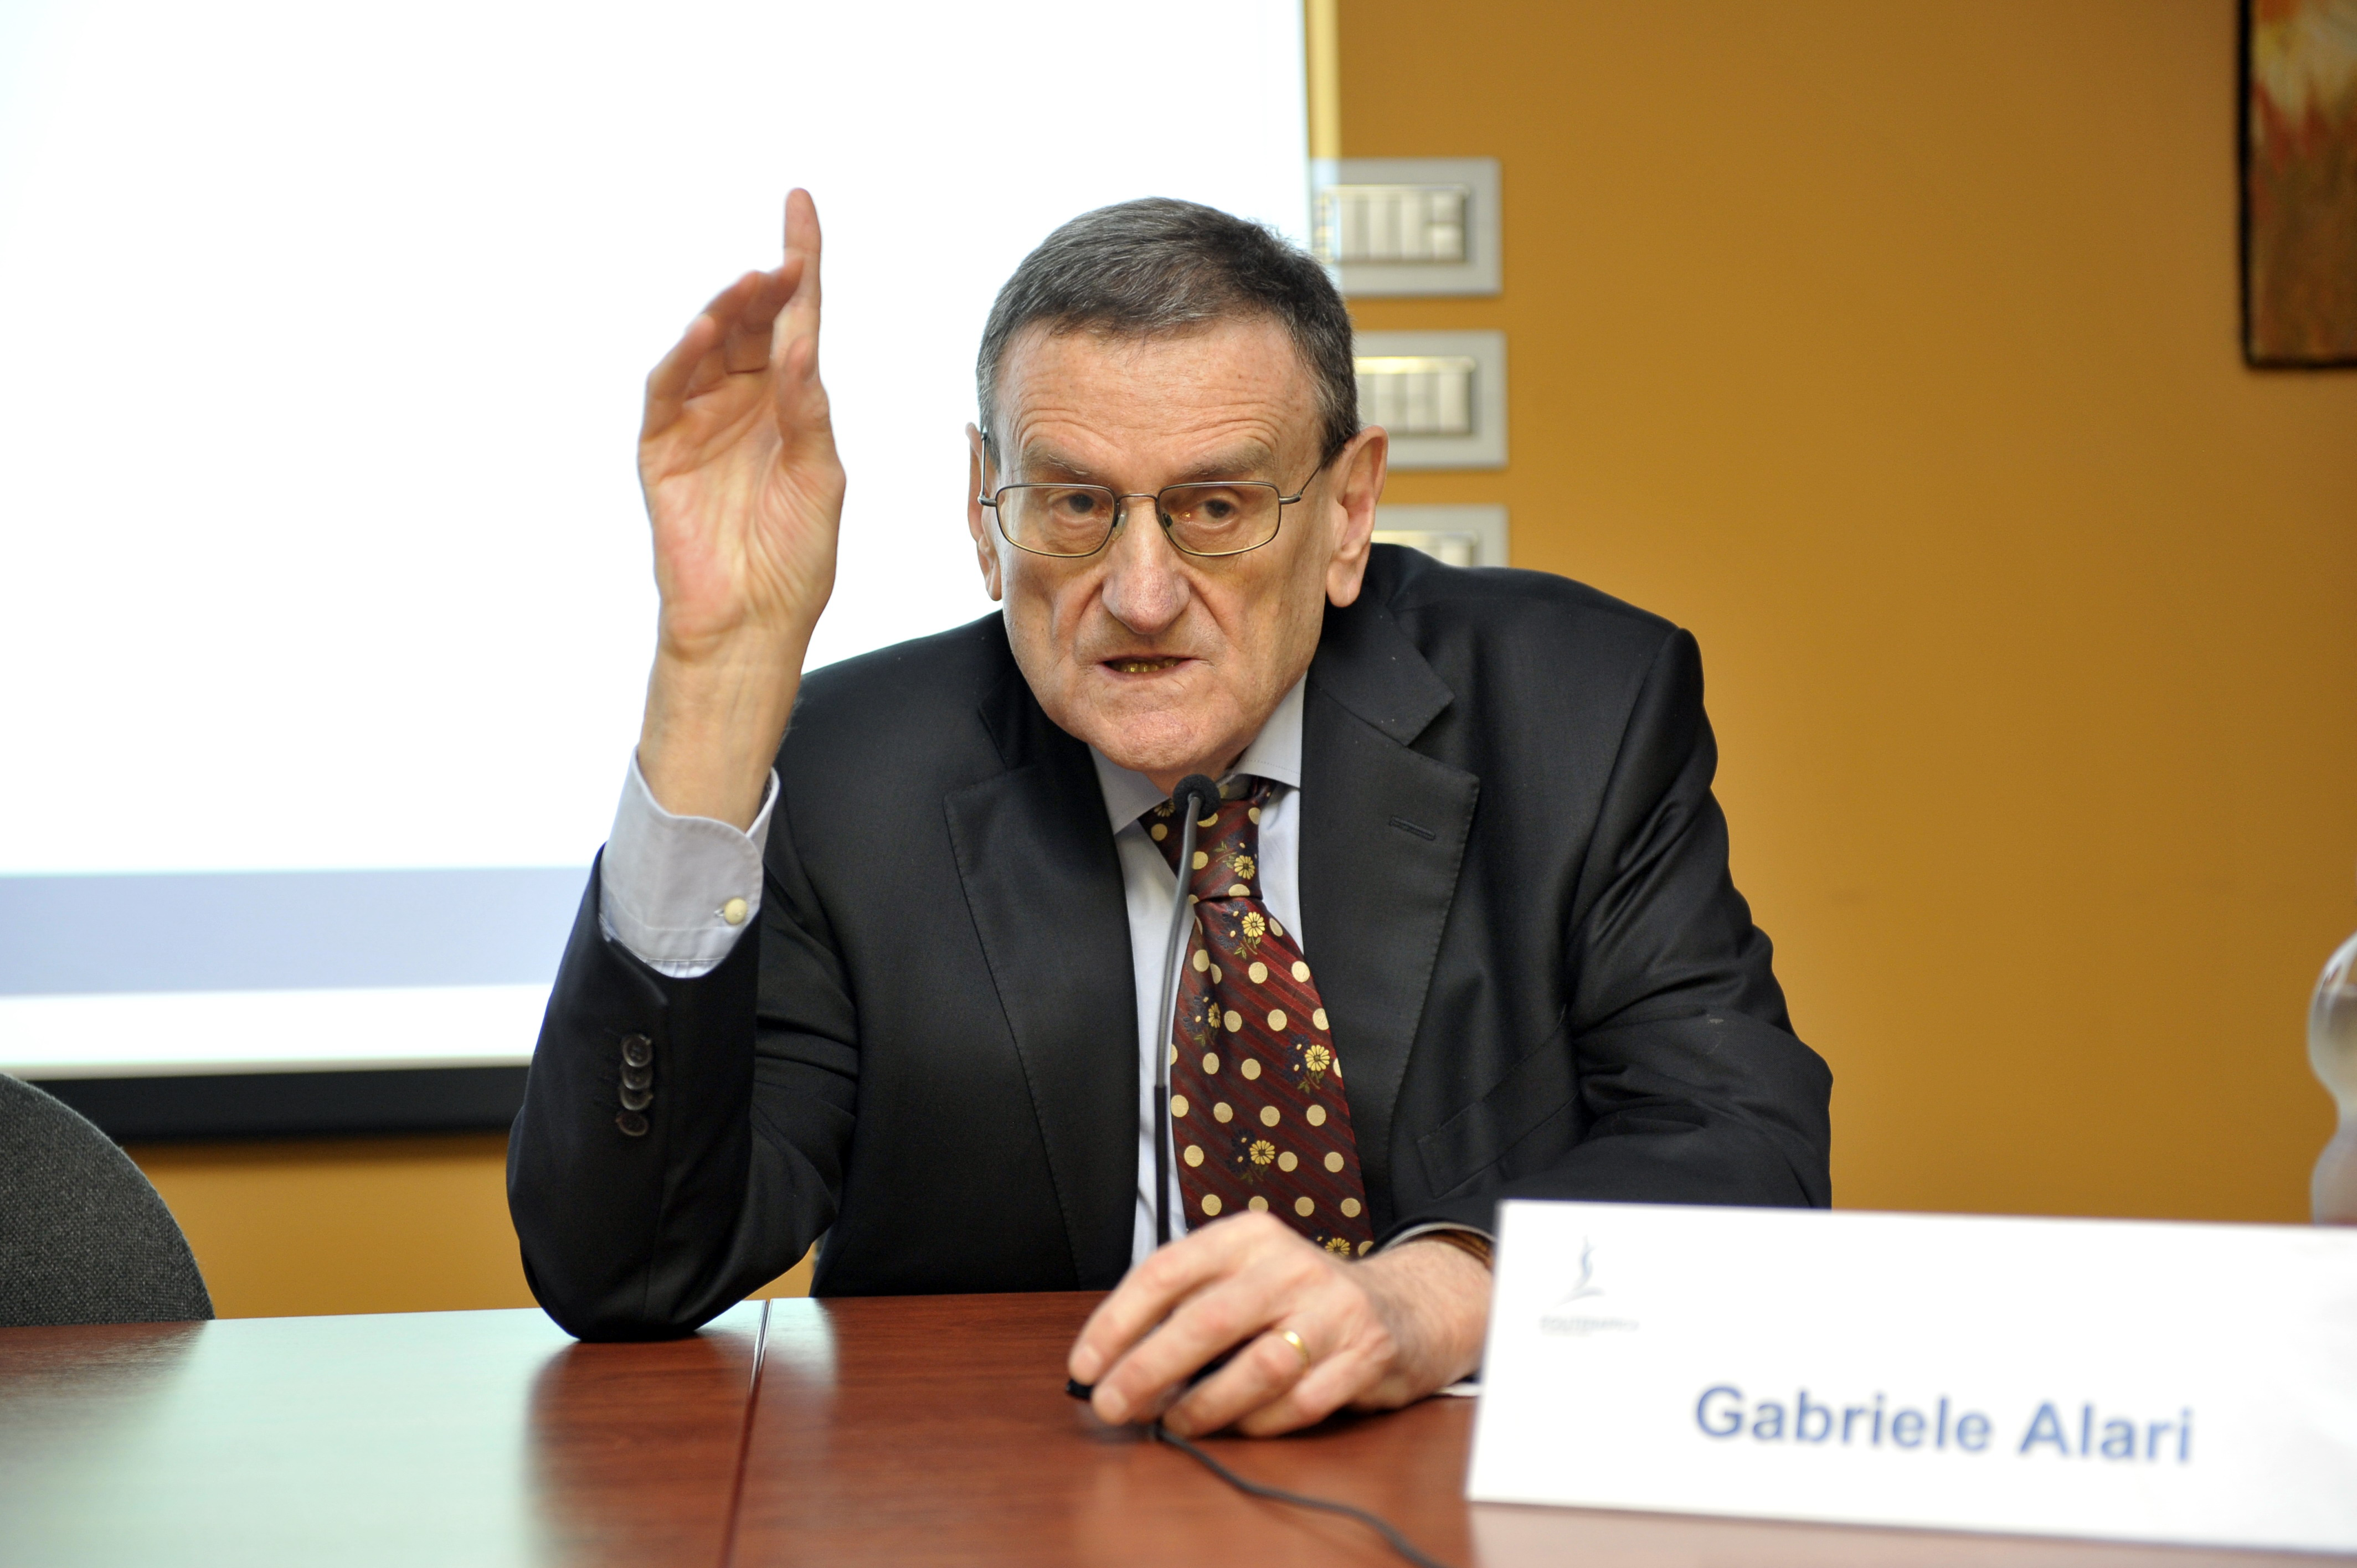 6.6.2015 - Modera Gabriele Alari, Angiologo 2